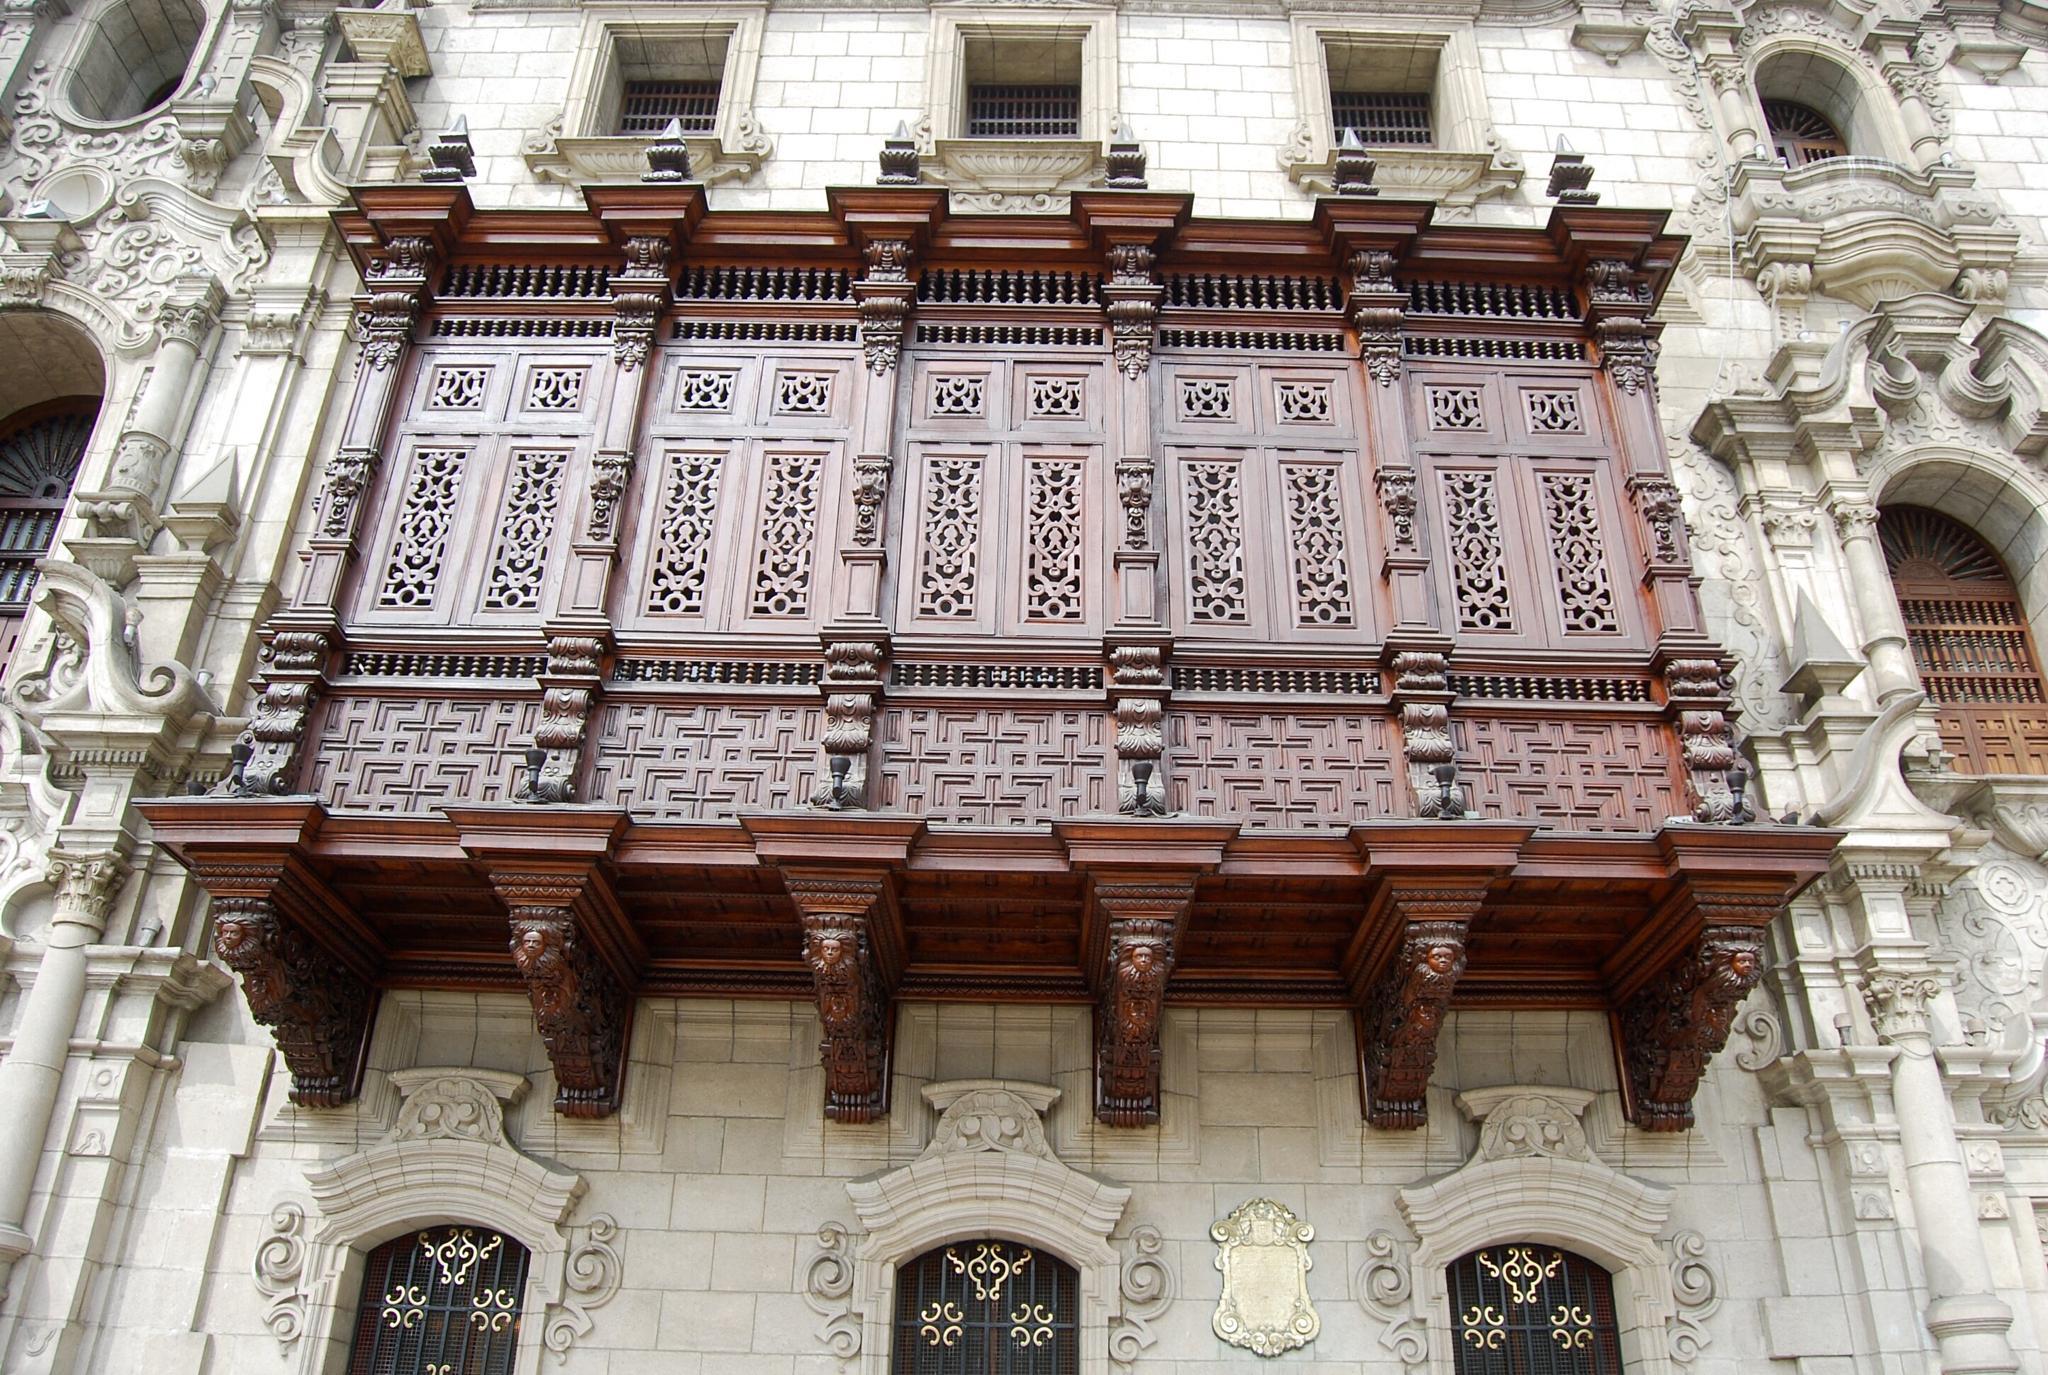 Wood balcony typical for Lima and Peru by Adi Gli